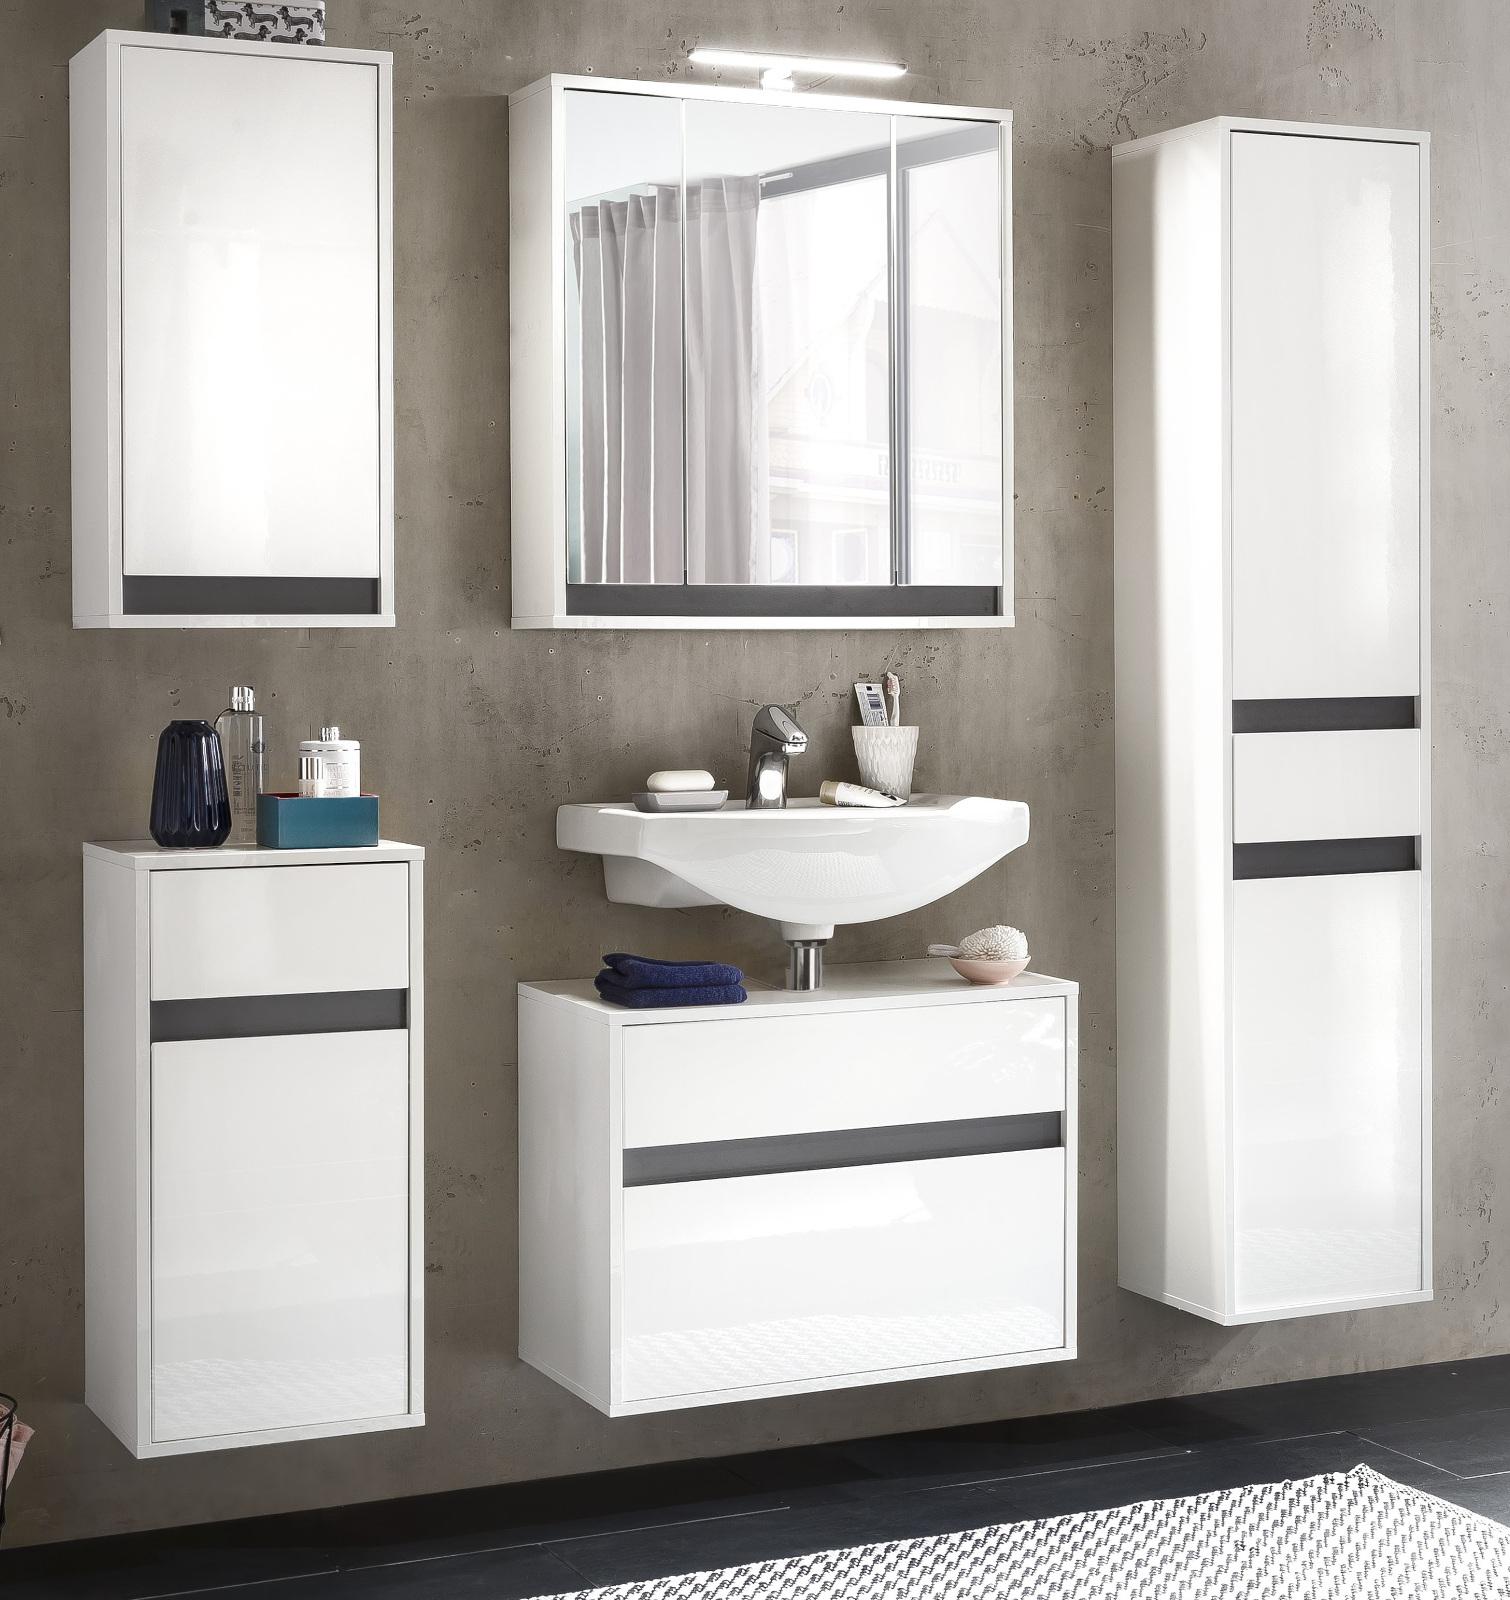 hochschrank h ngeschrank sol lack hochglanz wei. Black Bedroom Furniture Sets. Home Design Ideas